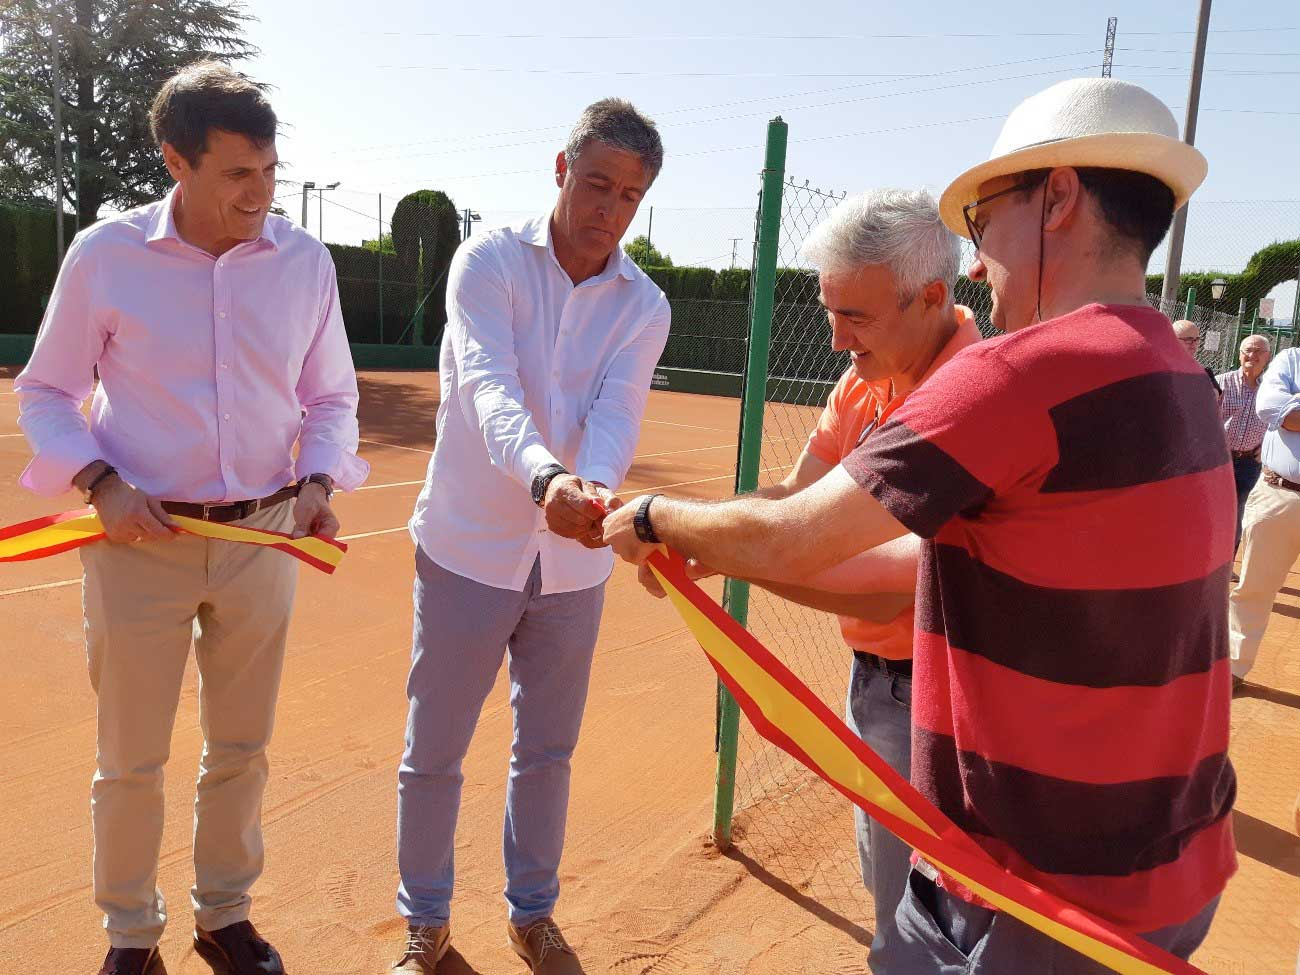 Club de tenis Cid Hiaya Seguros J Castillo